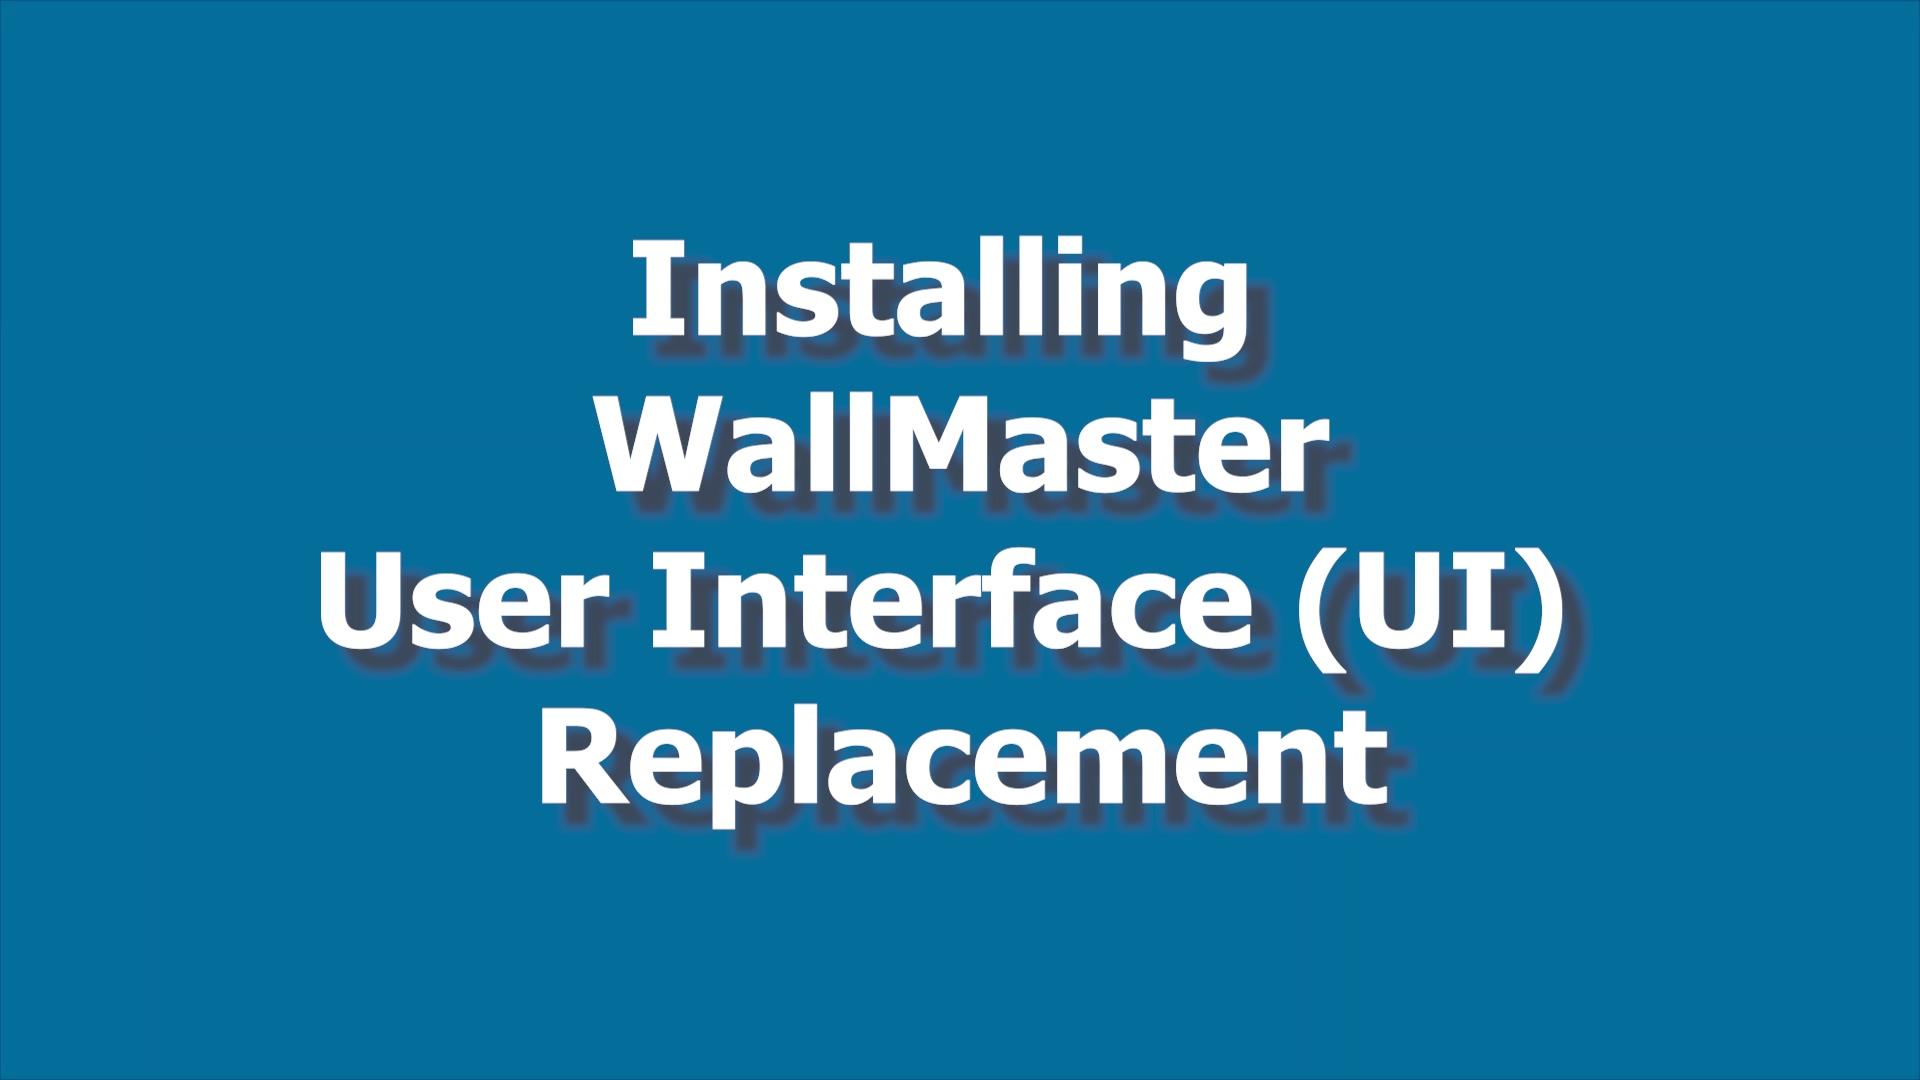 WallMaster IU Board Install